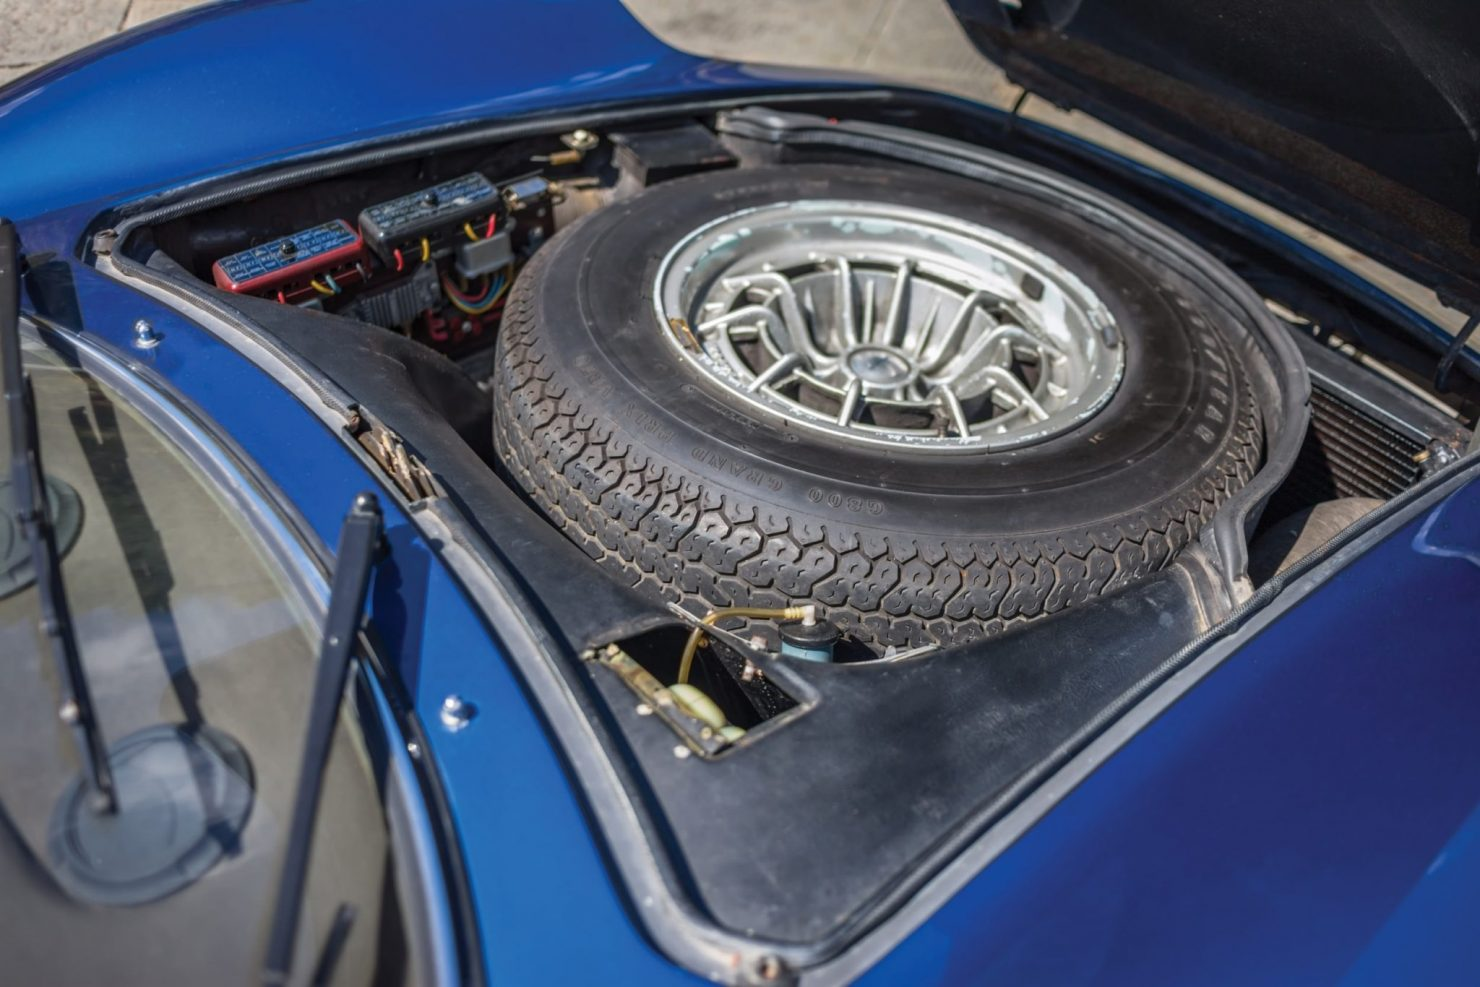 ferrari dino 246 gts car 22 1480x987 - 1973 Ferrari Dino 246 GTS